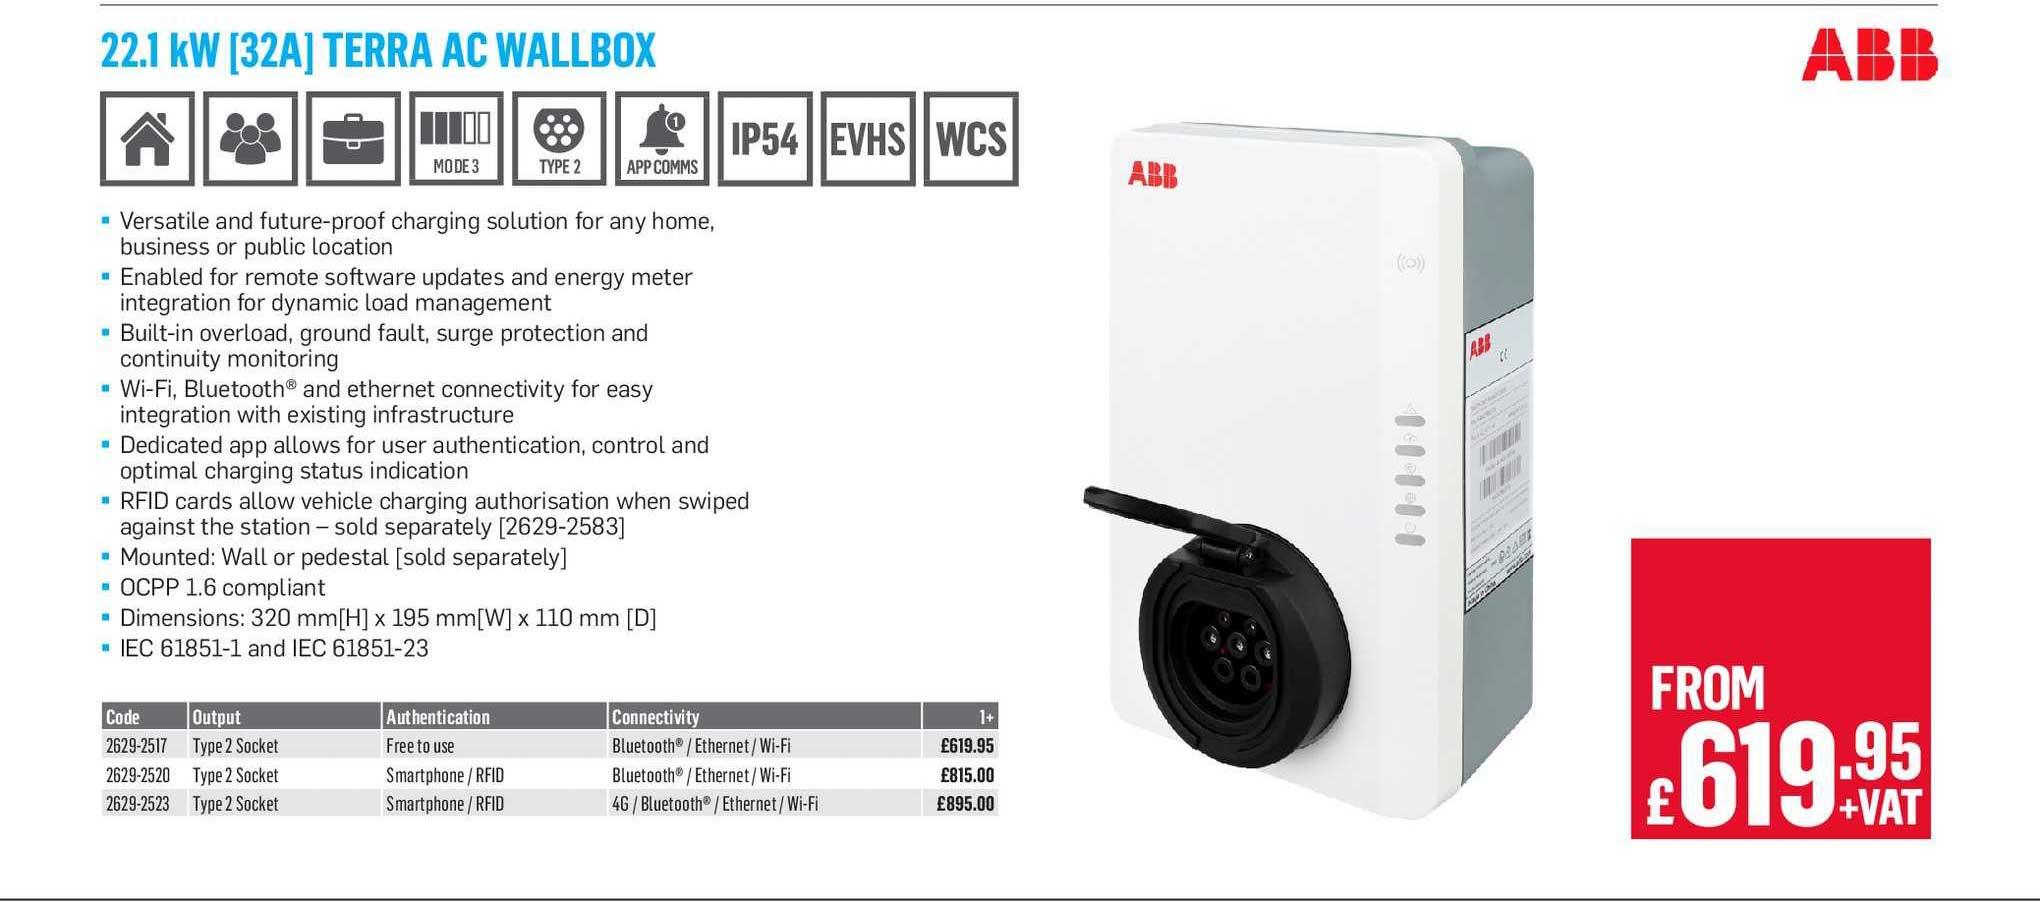 City Electrical Factors 22.1 Kw [32A] Terra AC Wallbox